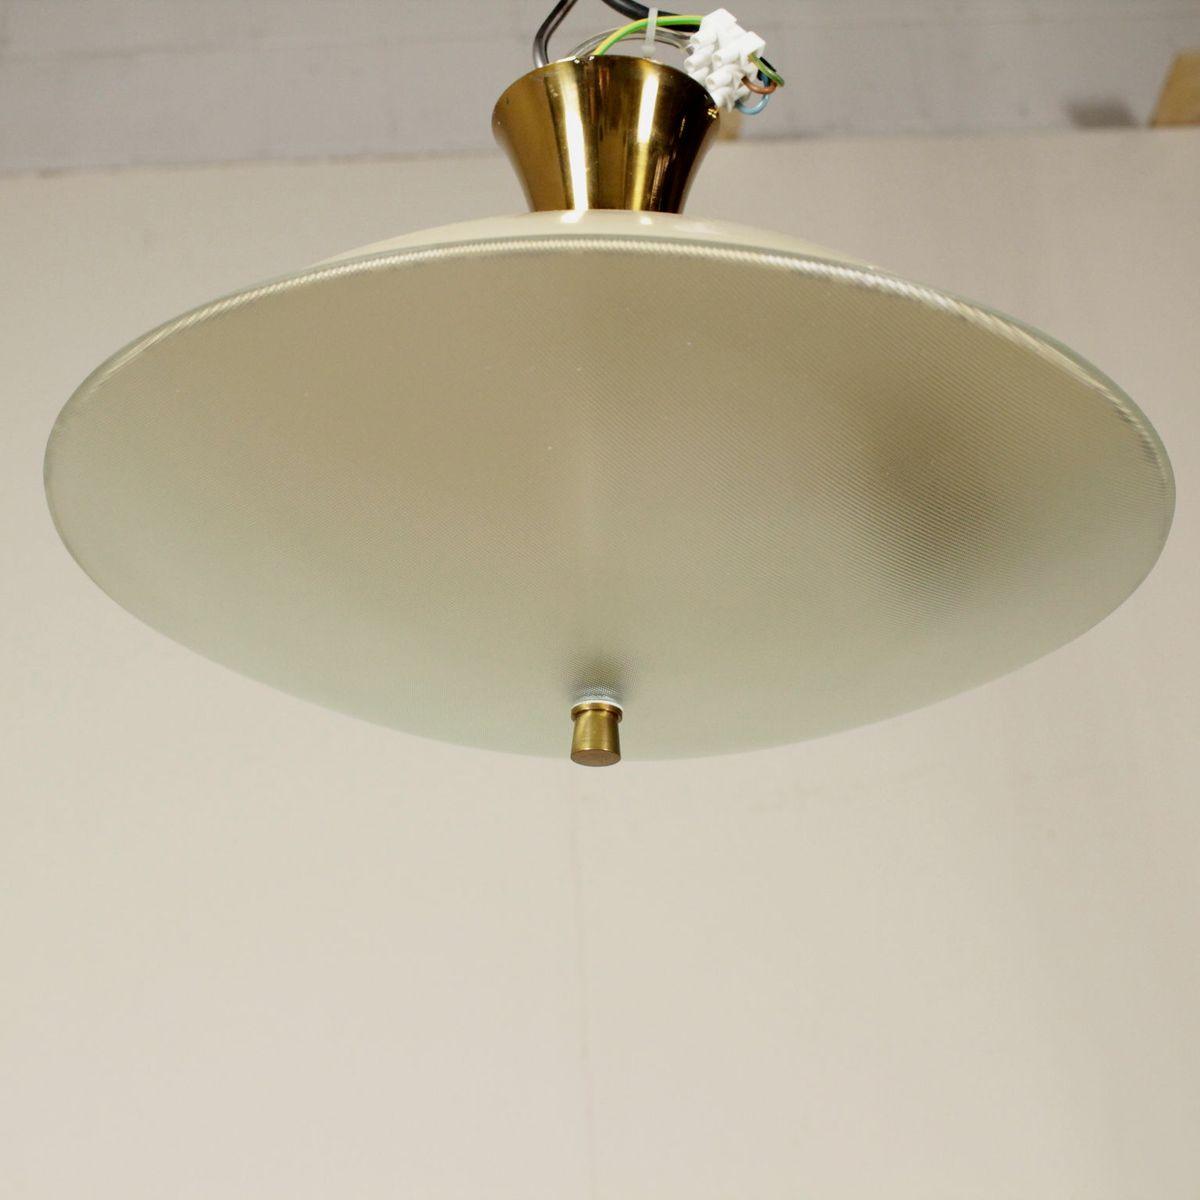 italienische deckenlampe aus messing glas und aluminium. Black Bedroom Furniture Sets. Home Design Ideas